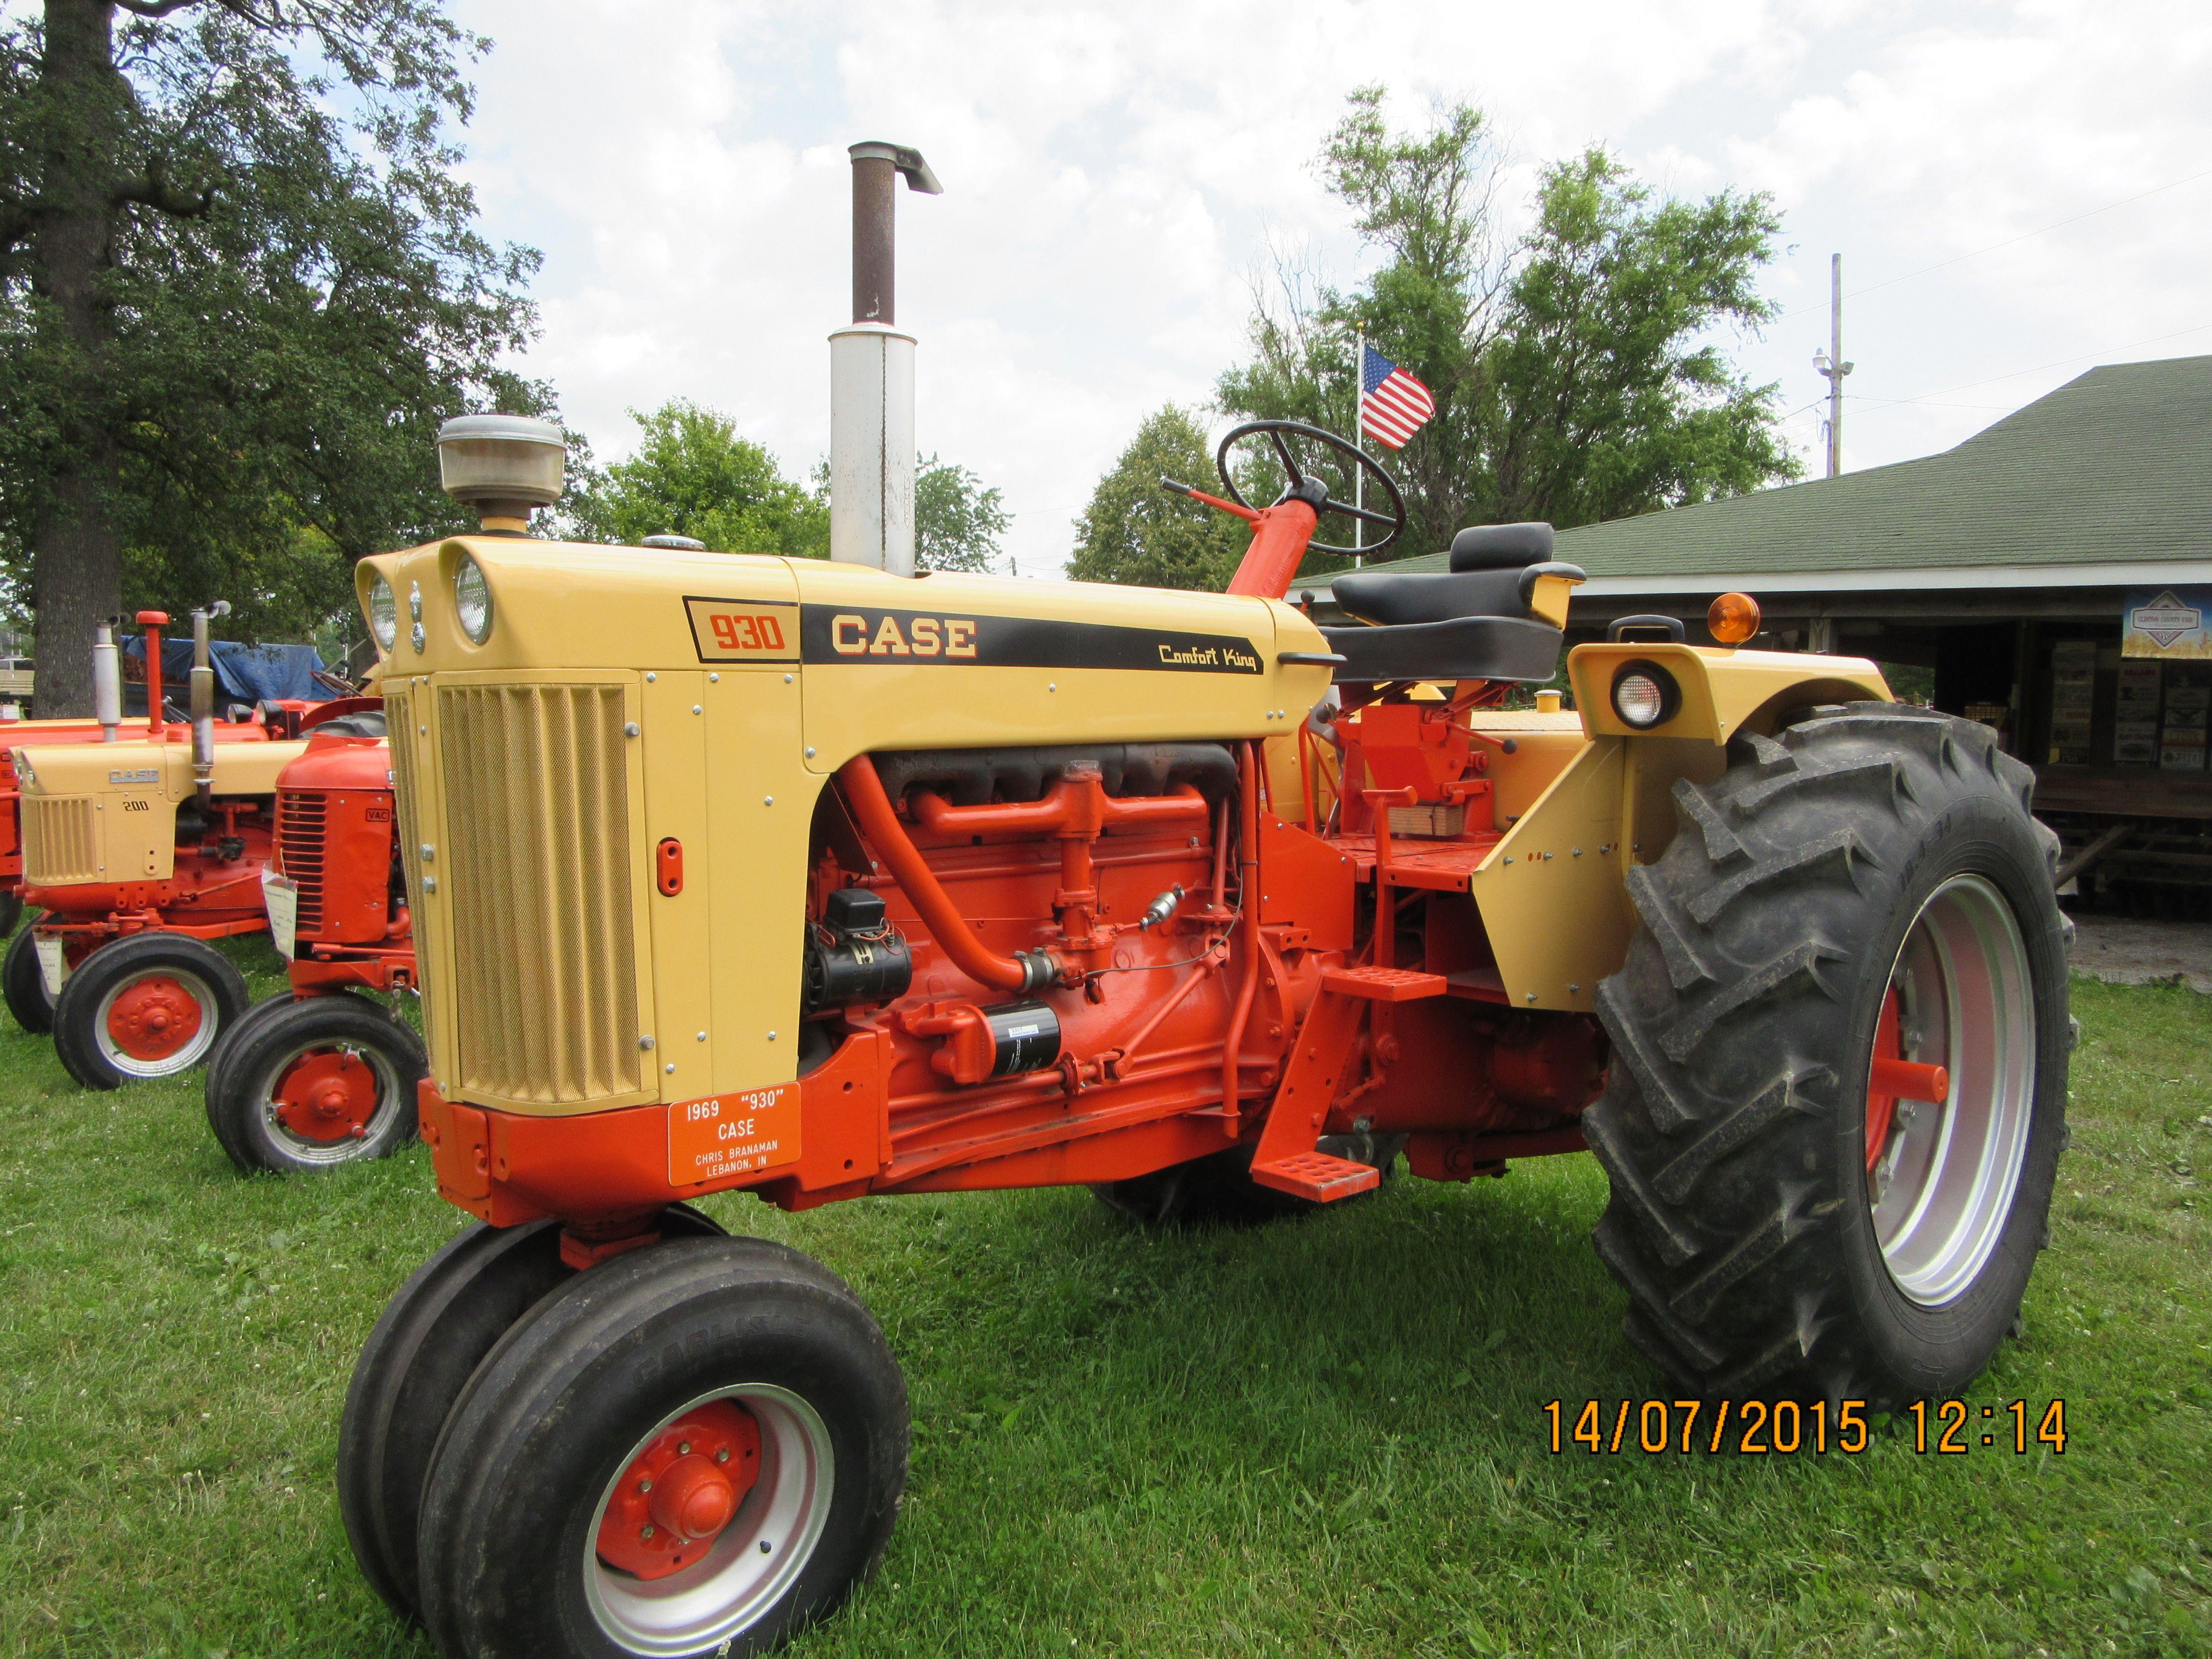 Vintage Case Tractor Parts : Case j i equipment pinterest tractor